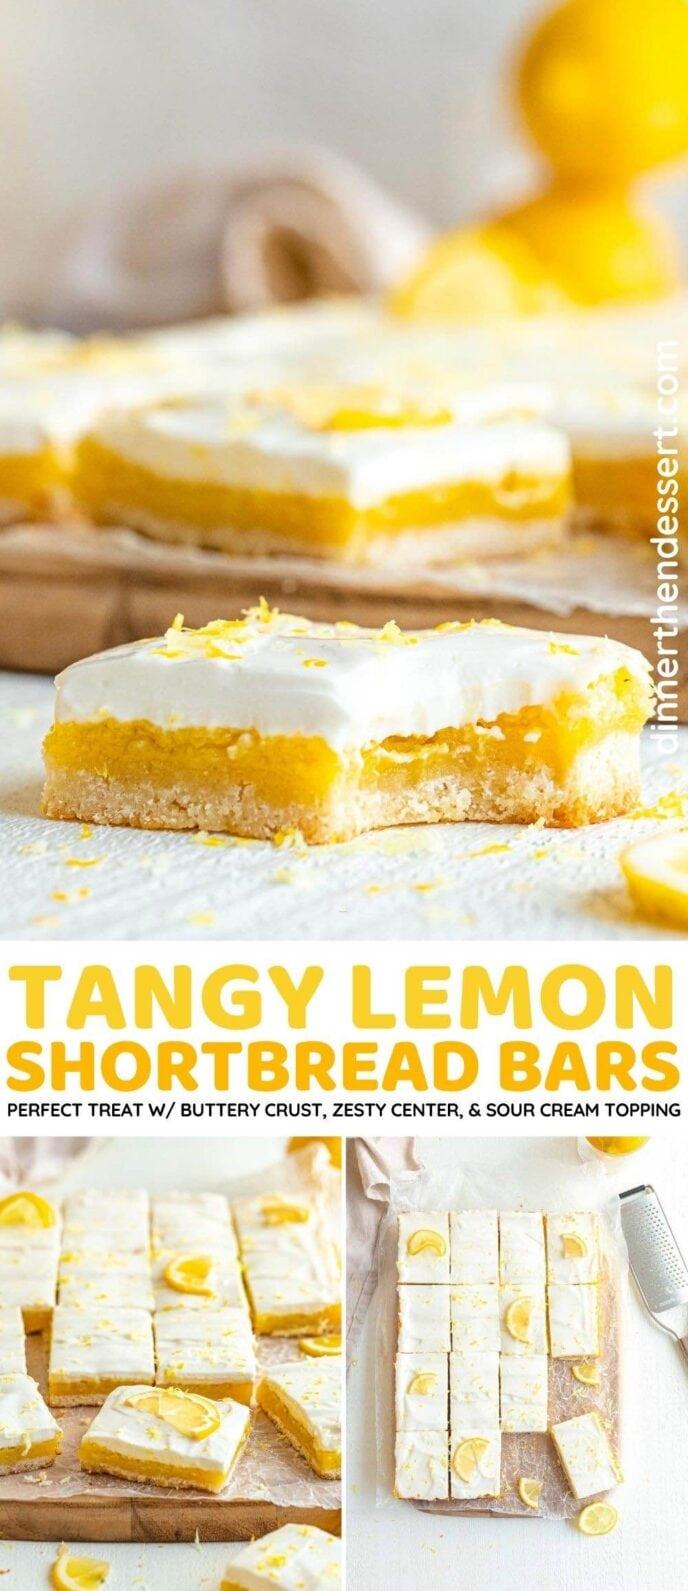 Lemon Shortbread Bars collage